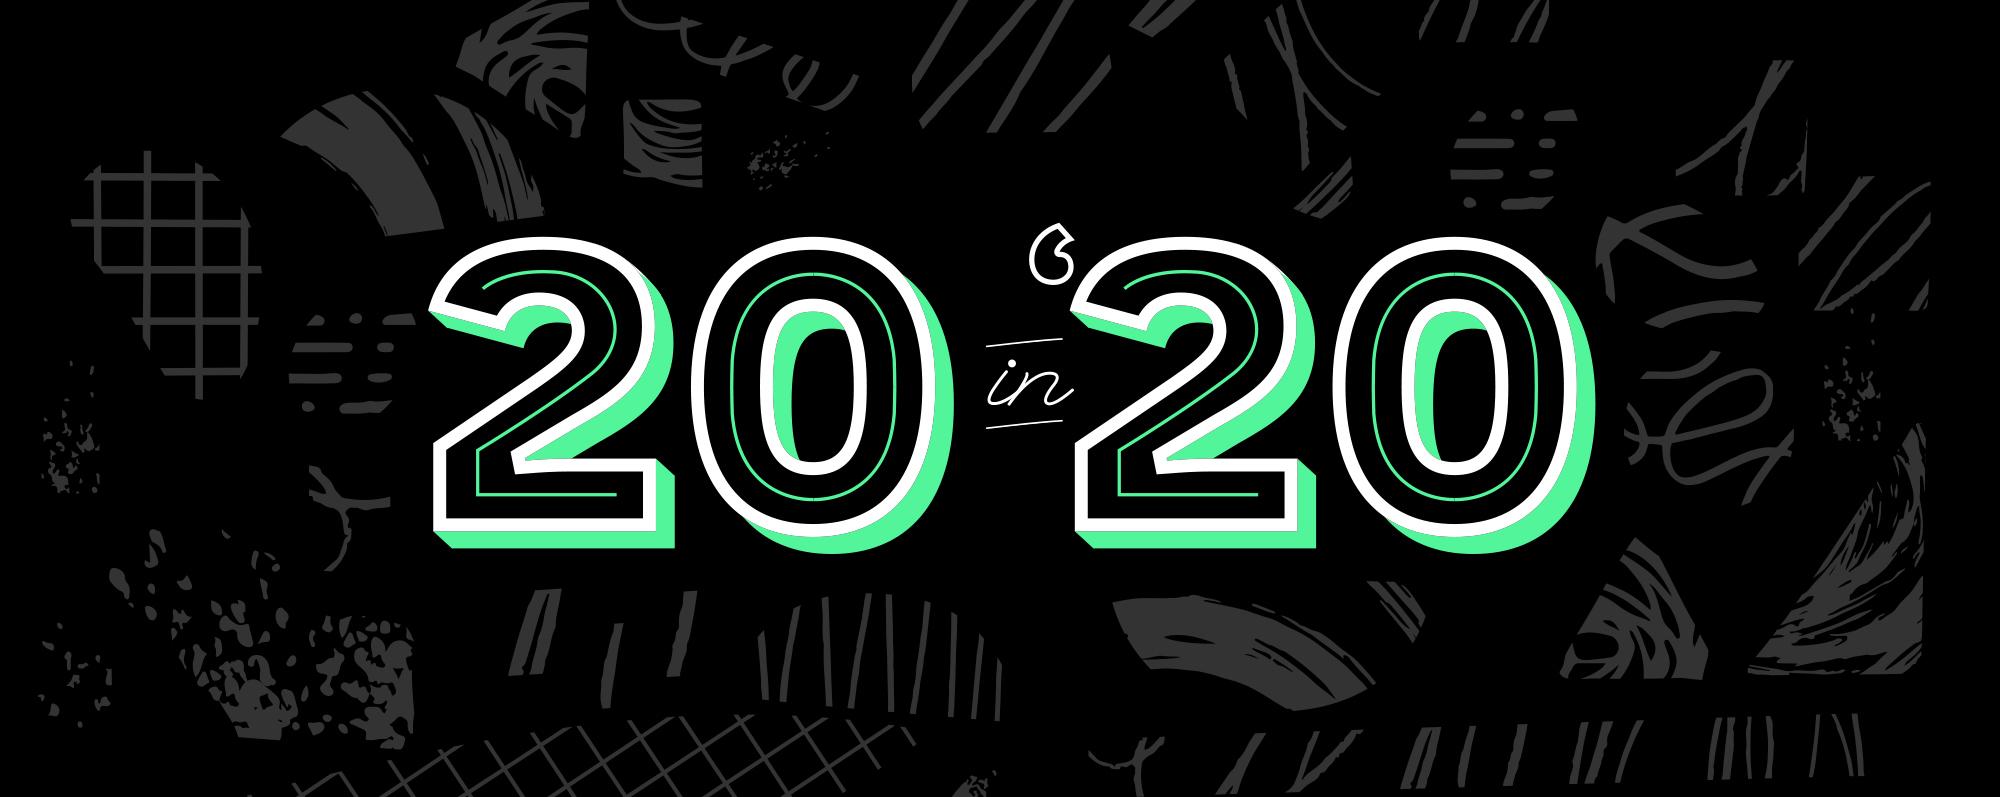 2020-blkbanner-2